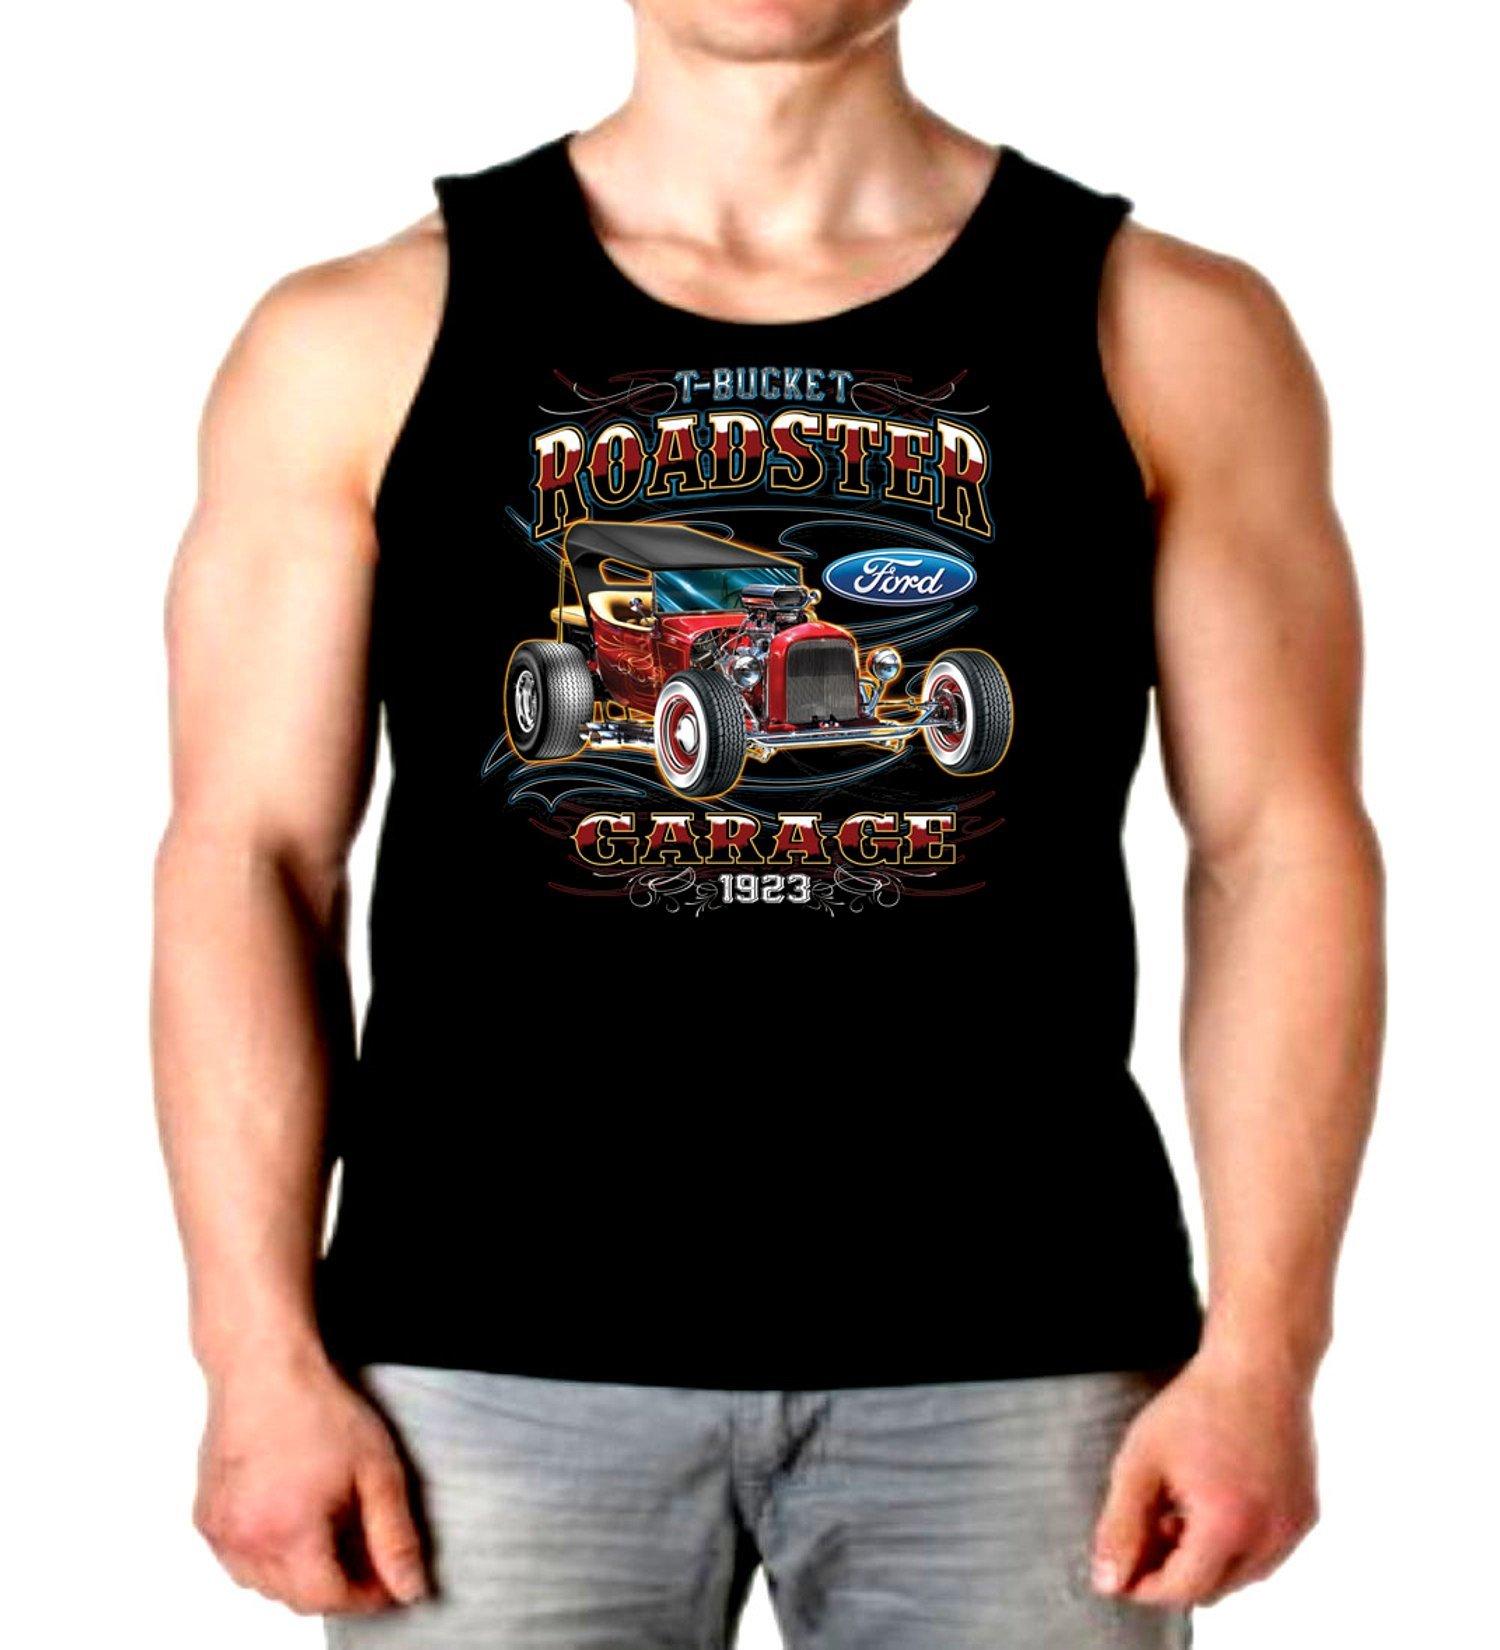 Tank Top T Bucket Roadster Garage S Muscle Shirt S 2 6920